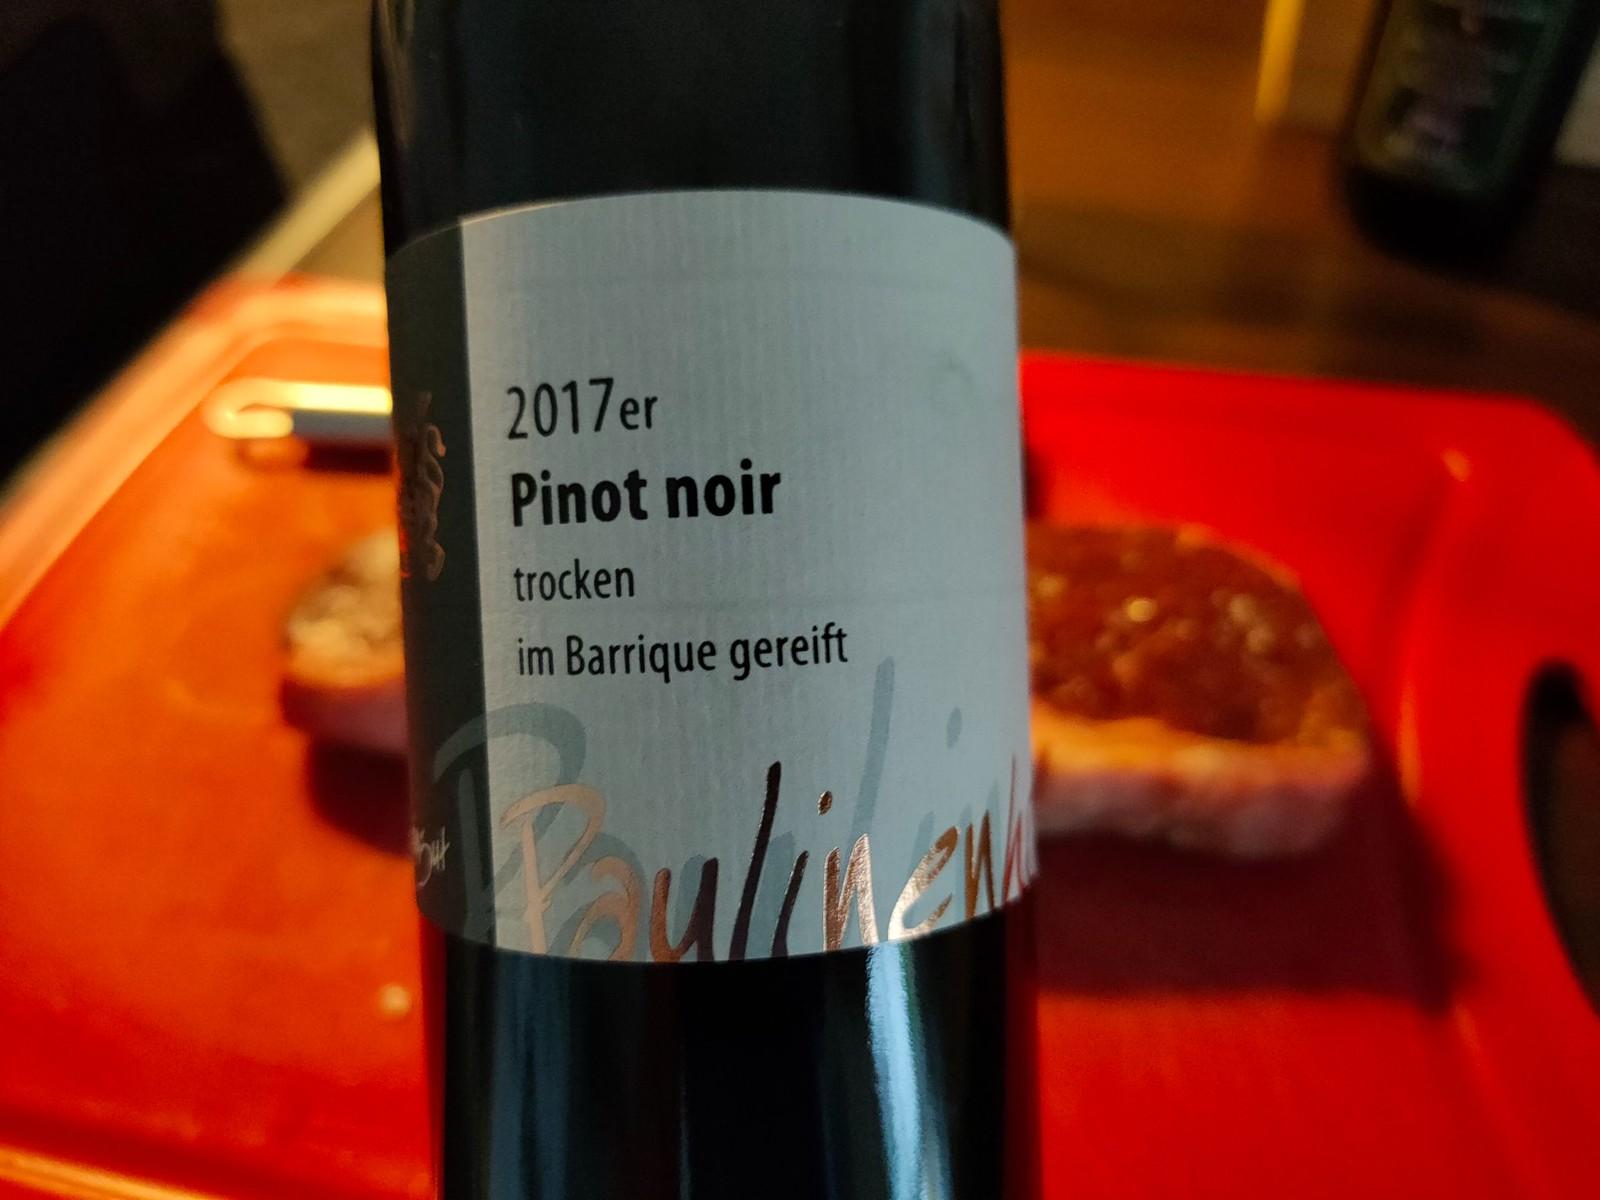 2017er Pinot noir trocken, im Barrique gereift - vom Weingut Paulinenhof in Selzen